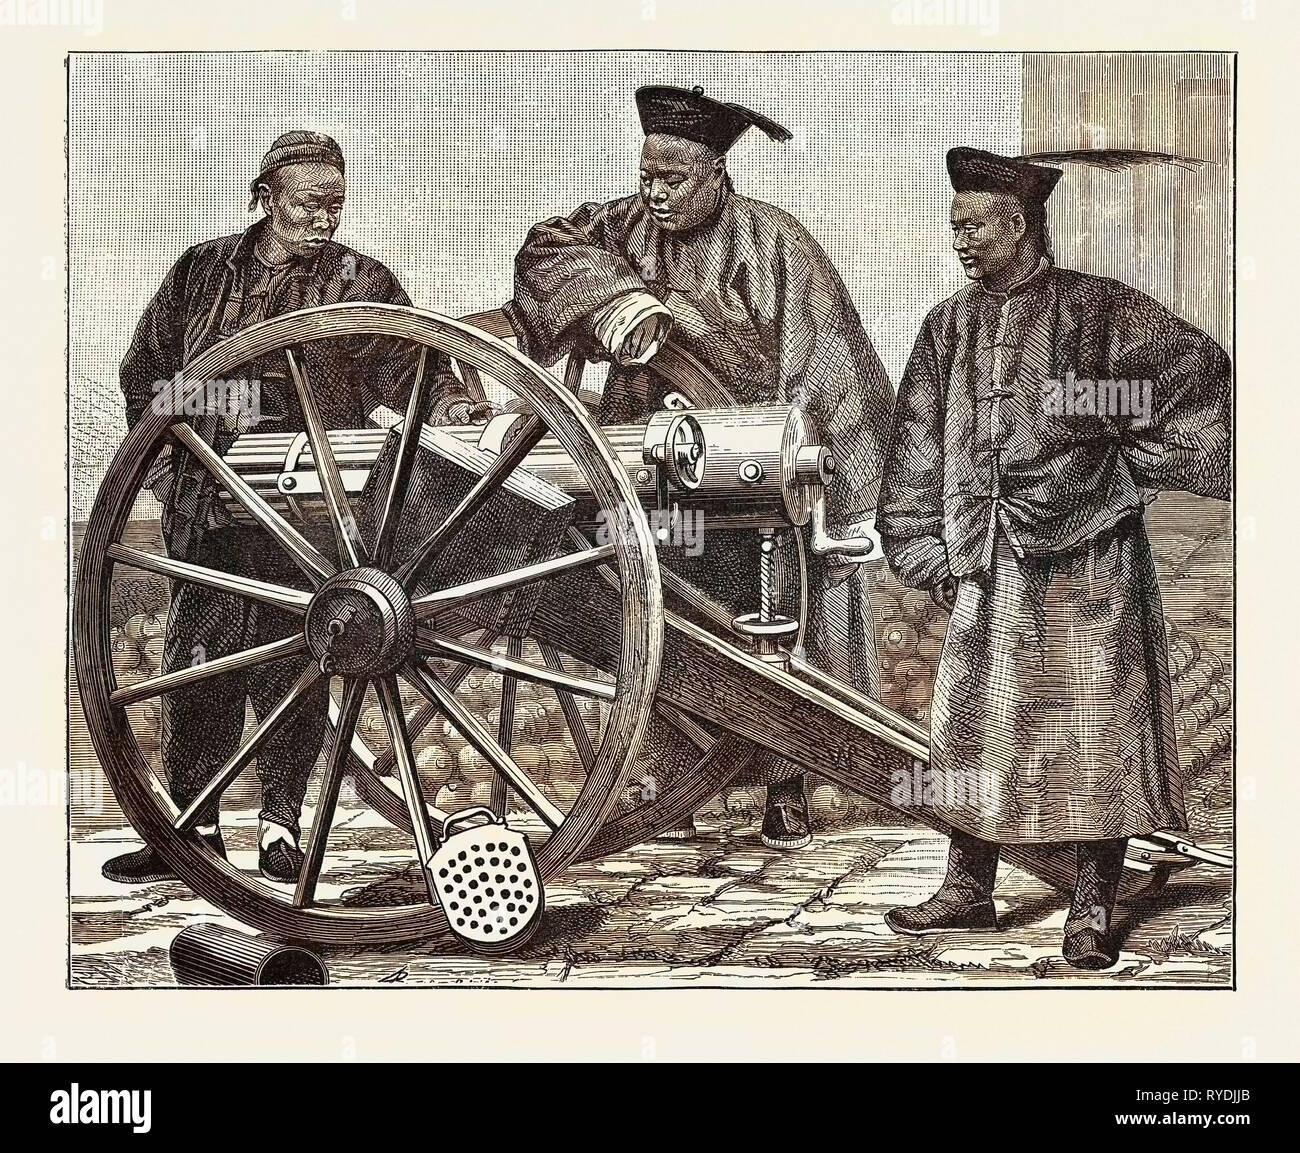 Chinese Artillerymen - Stock Image